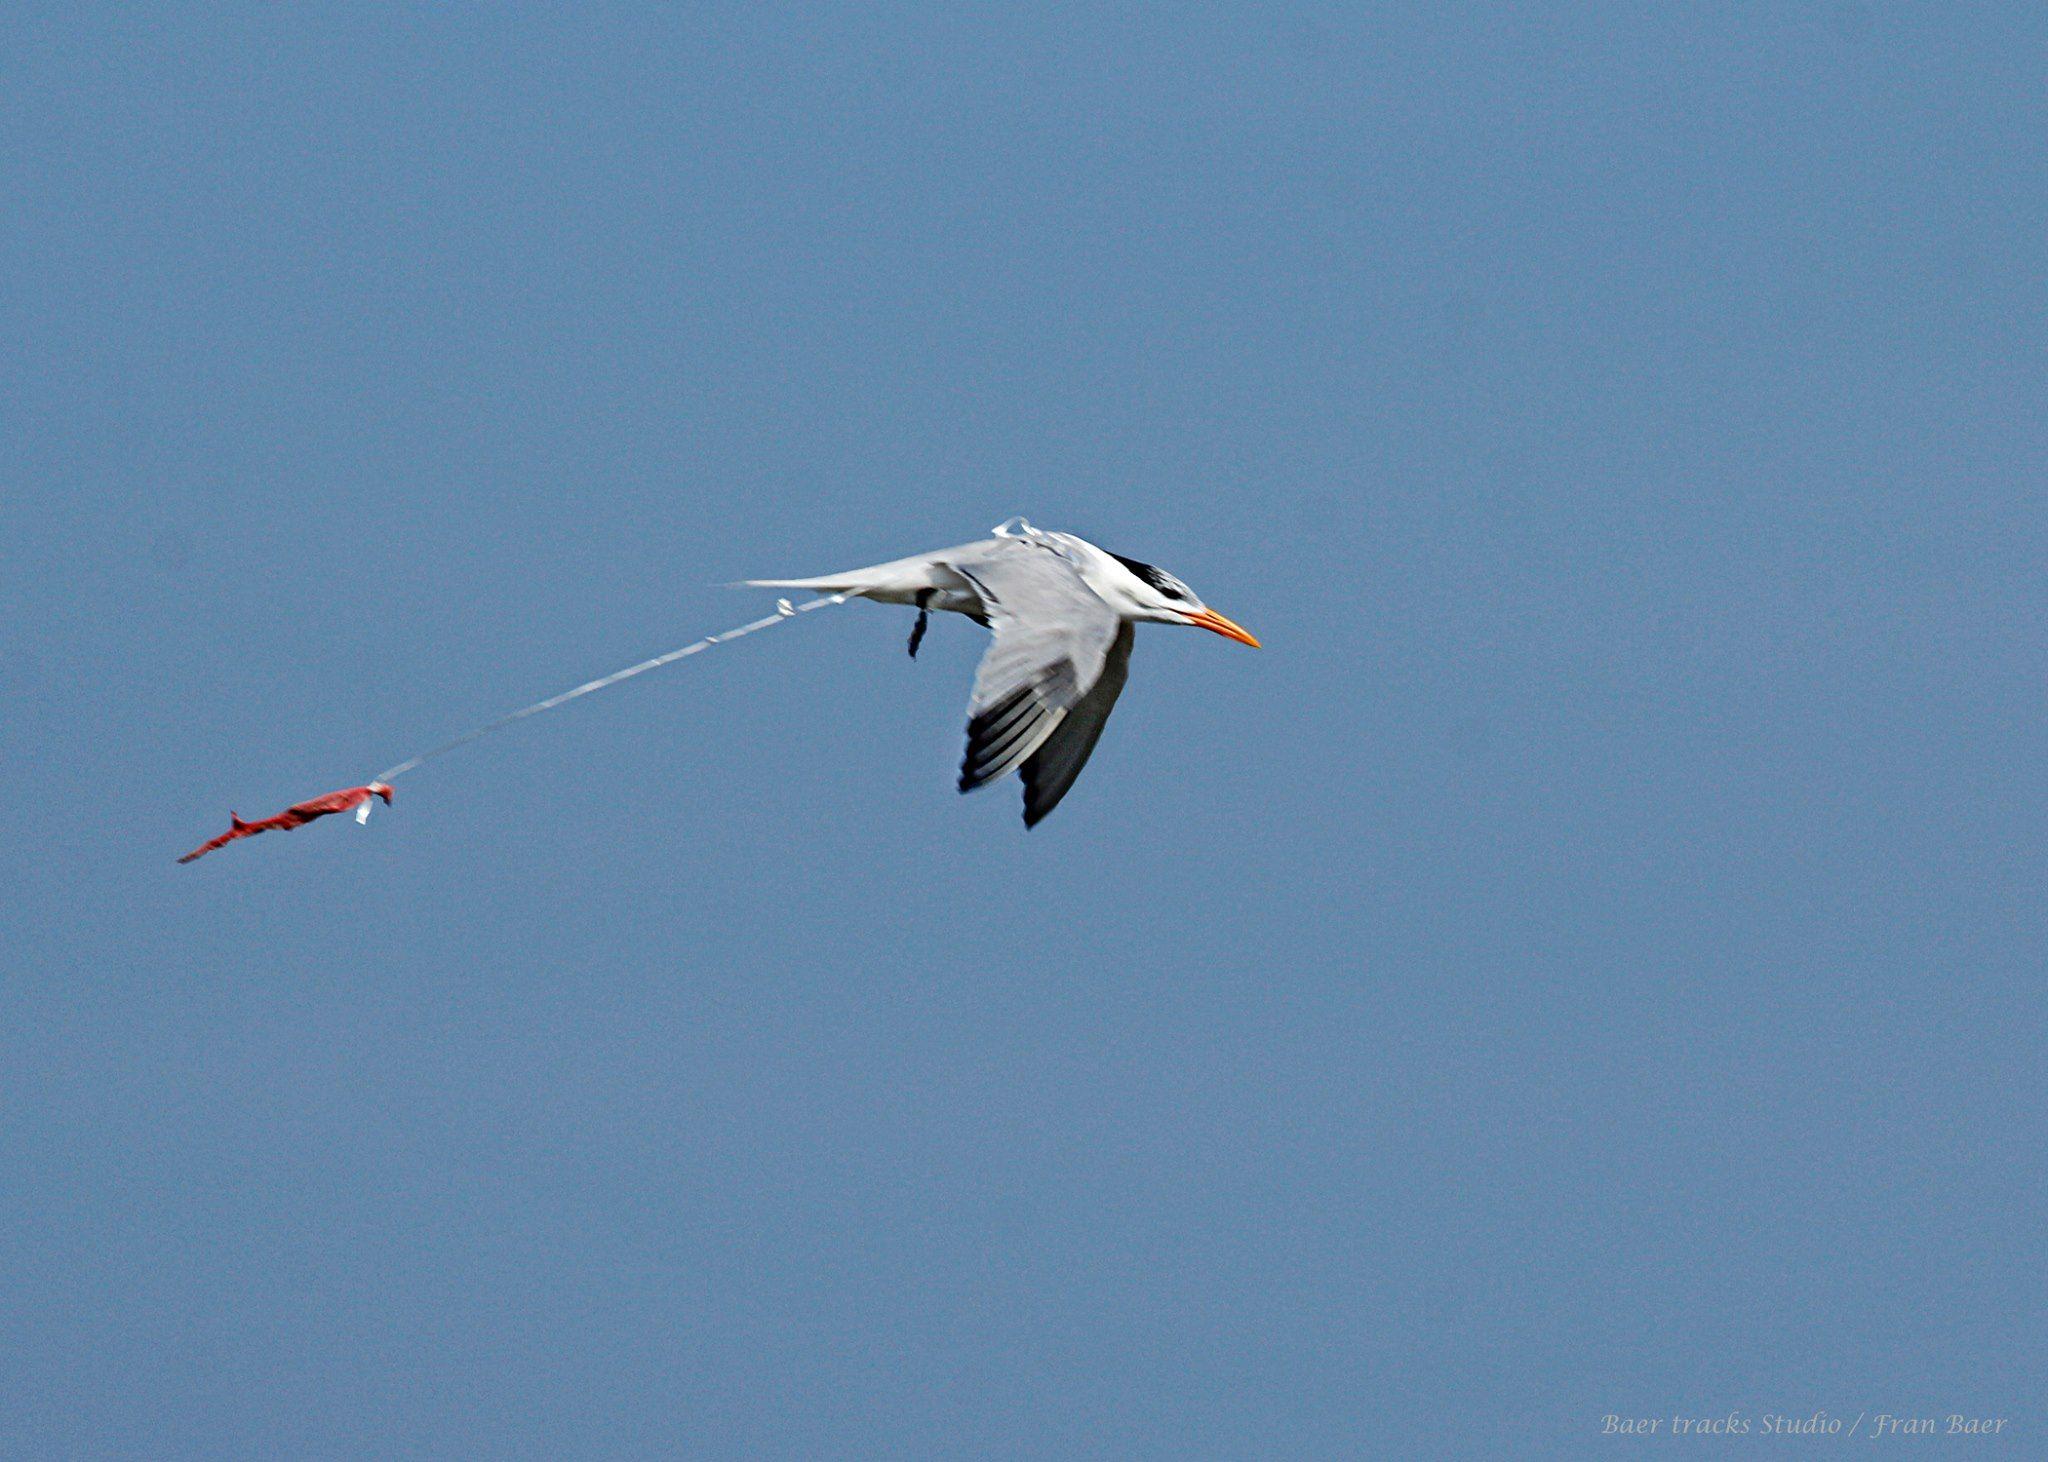 Balloon ribbons can entangle wildlife including shorebirds and sea turtles (Photo: Fran Bear)